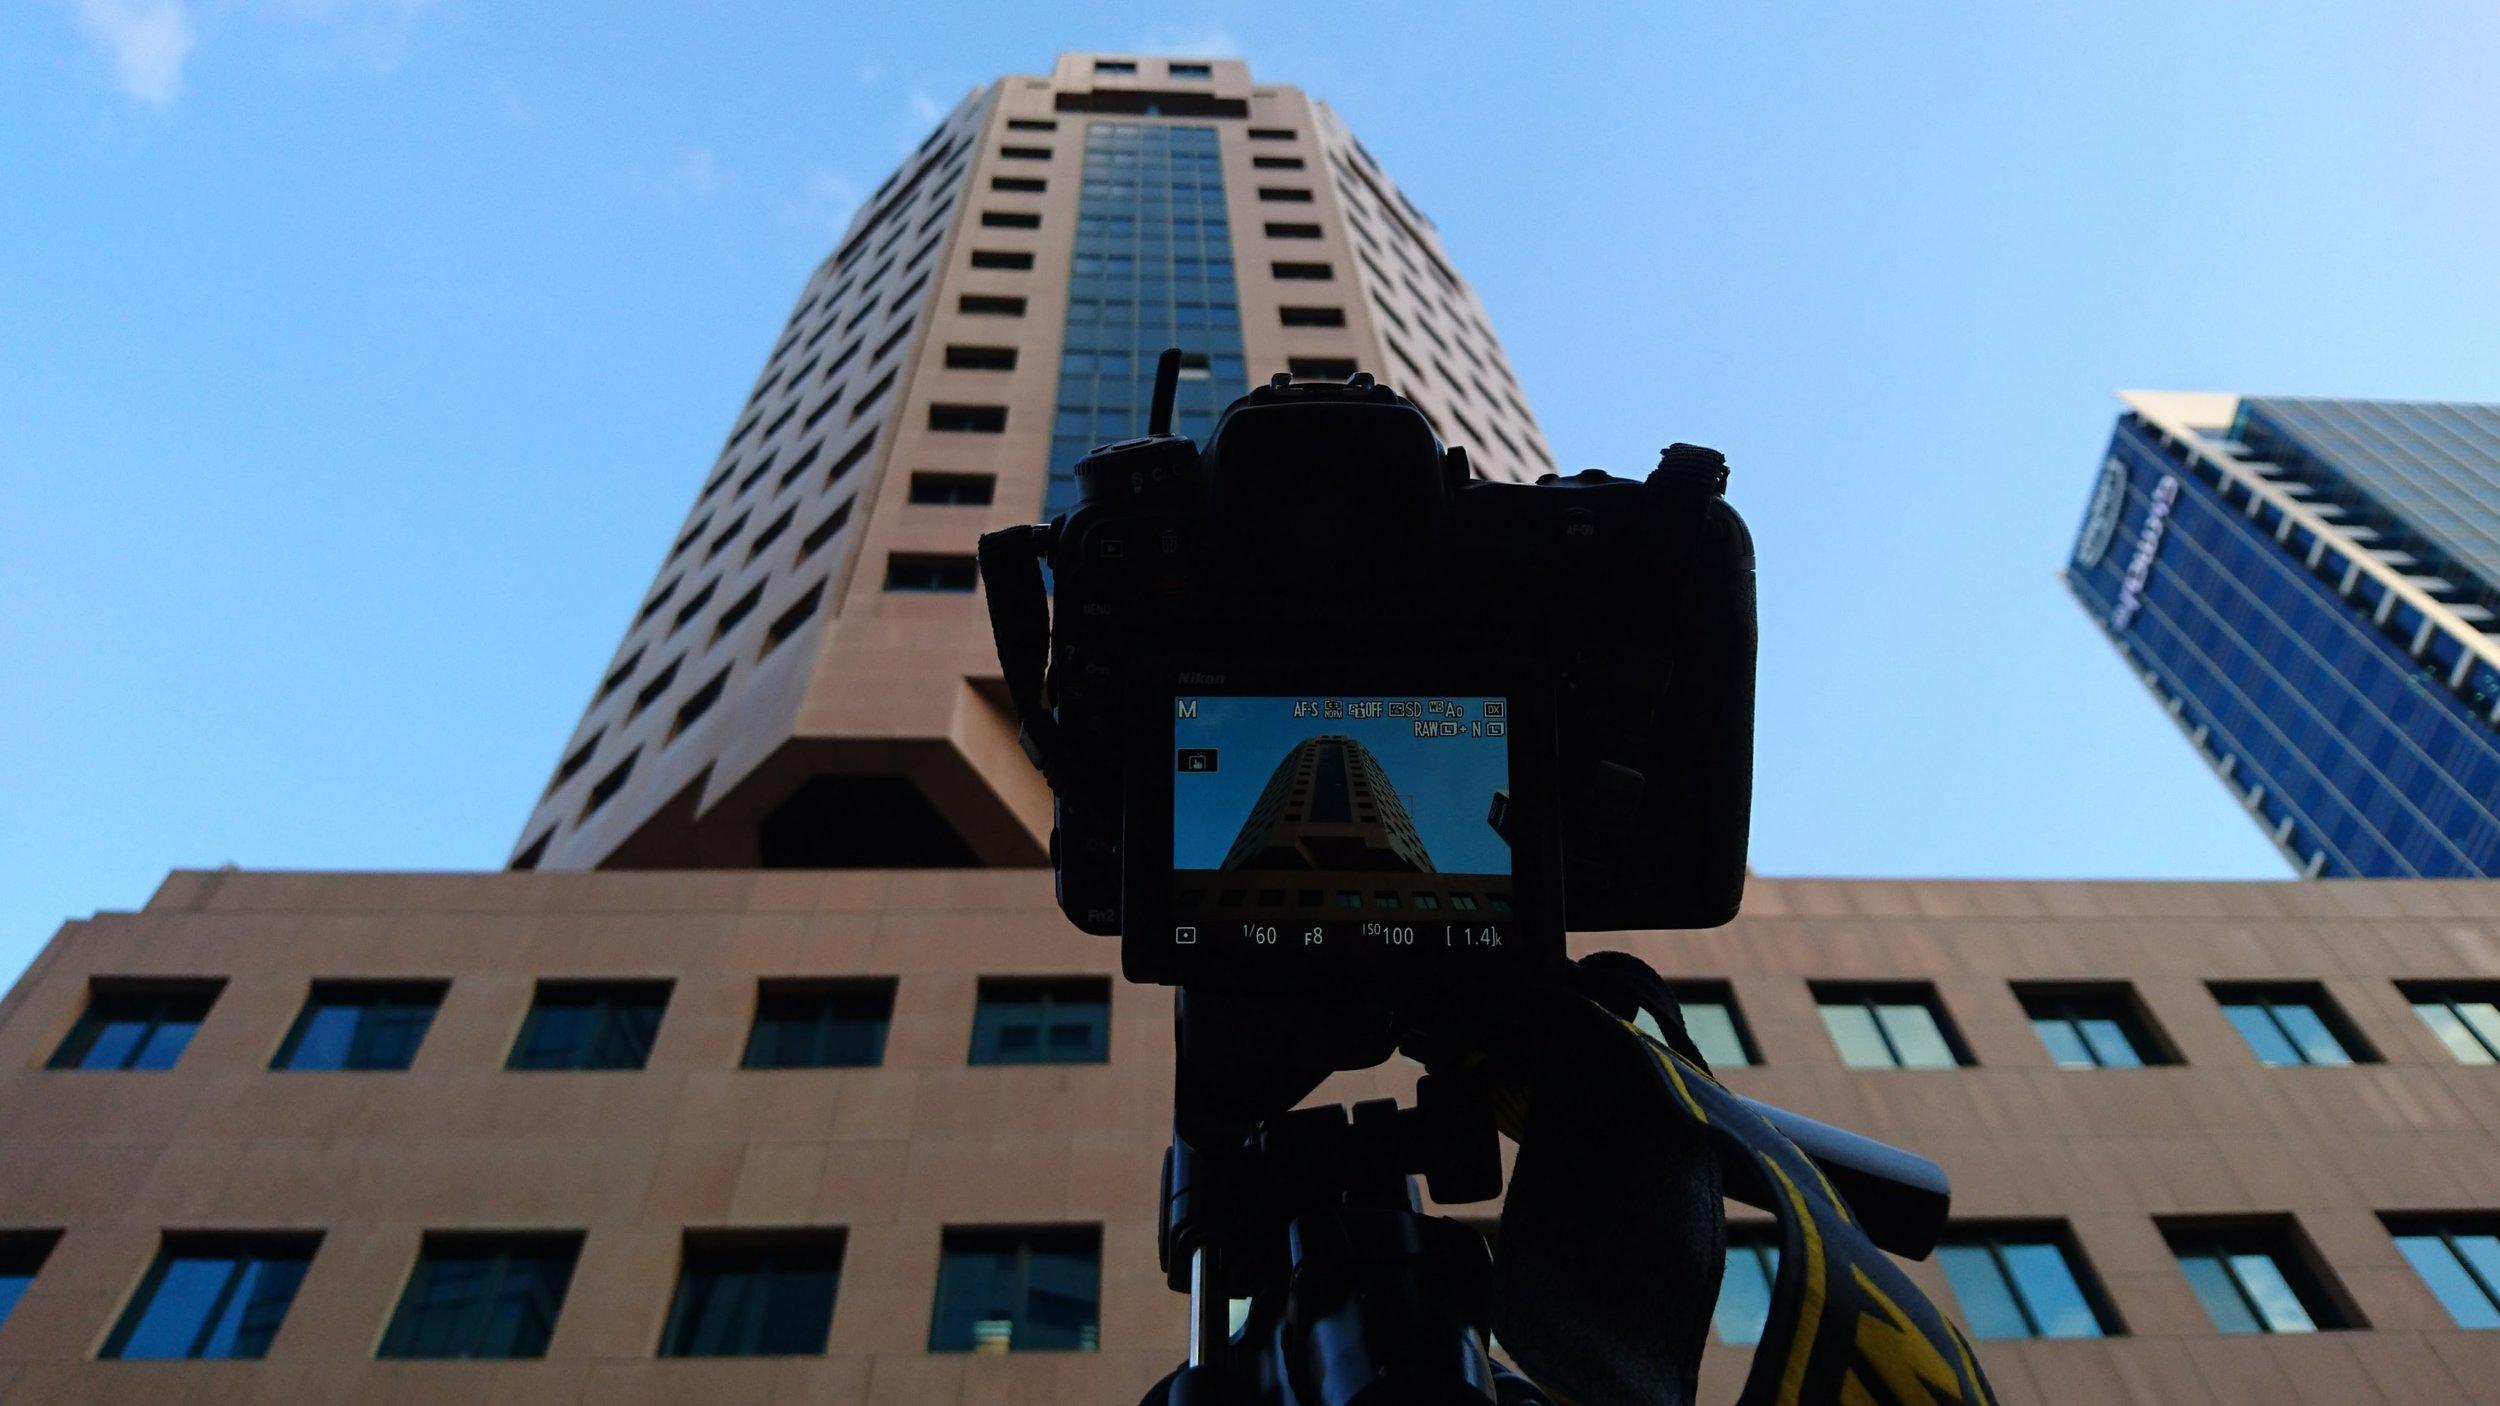 Nikon D500, Nikkor 10-24 3.5-5.6 @20mm, 1/60s,f8.0, ISO 100